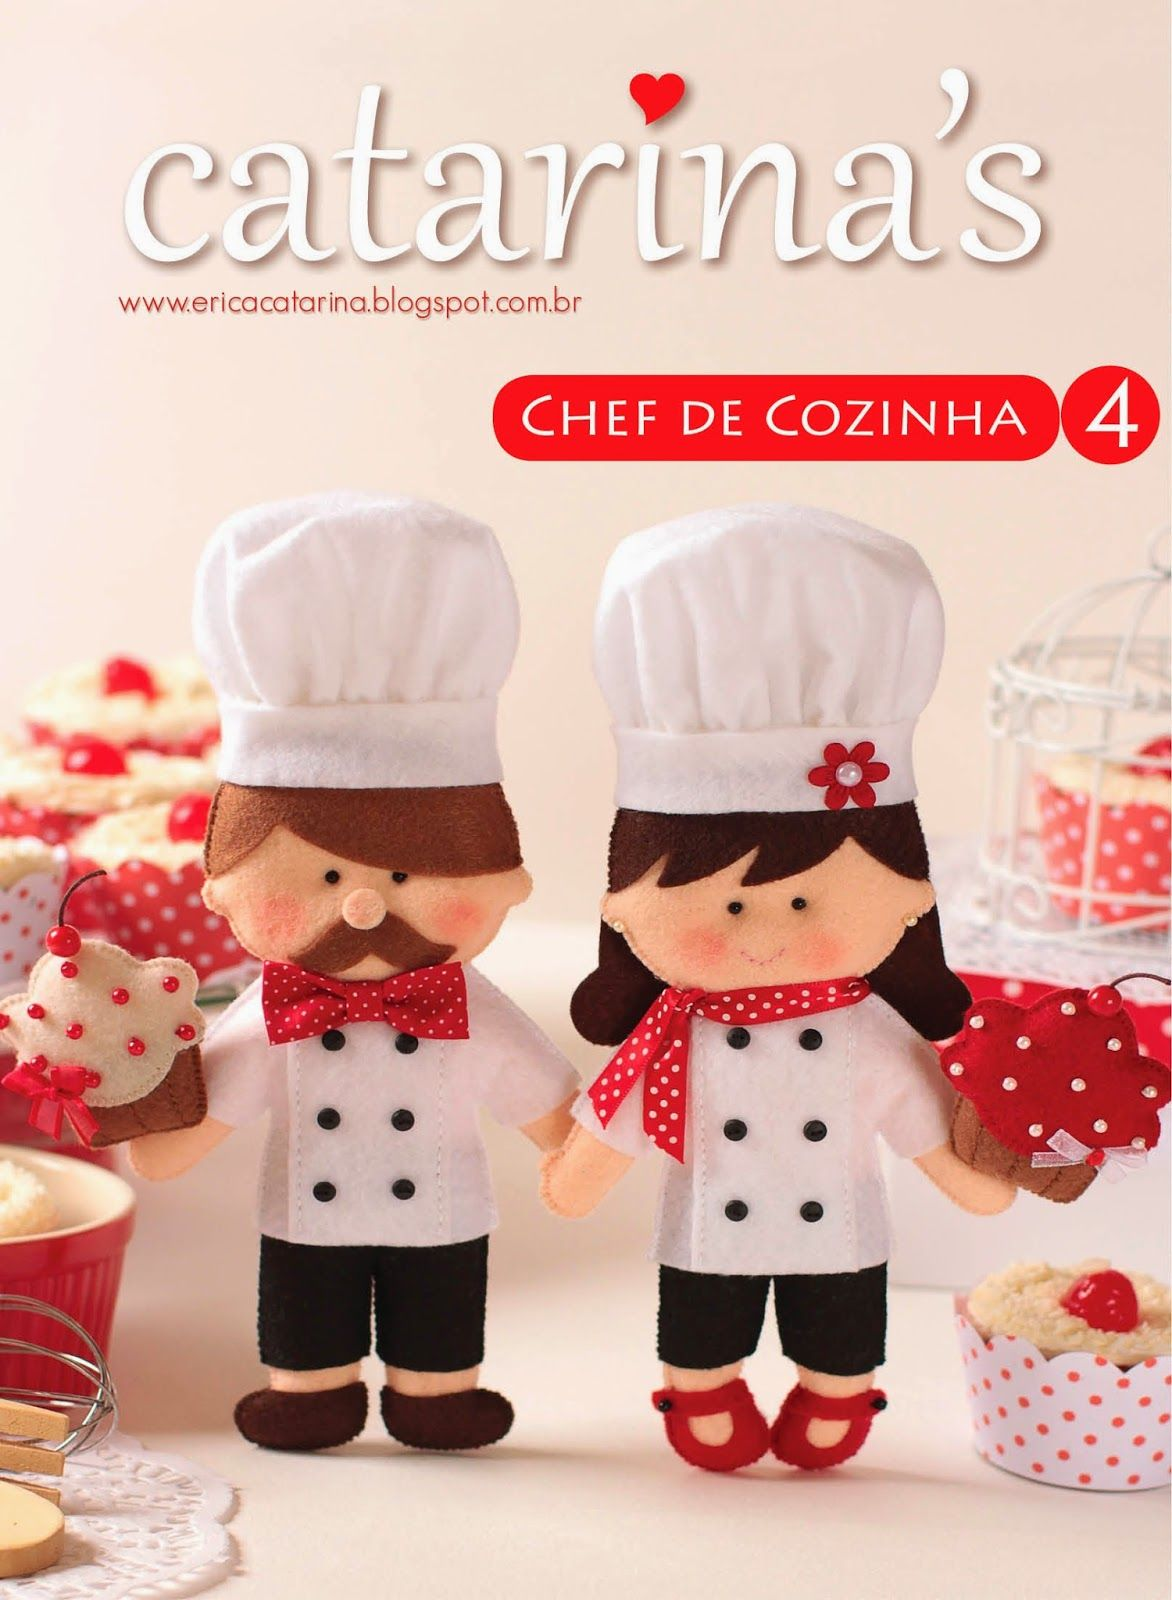 Ei Menina!: Apostila Digital Catarina's Chef de Cozinha